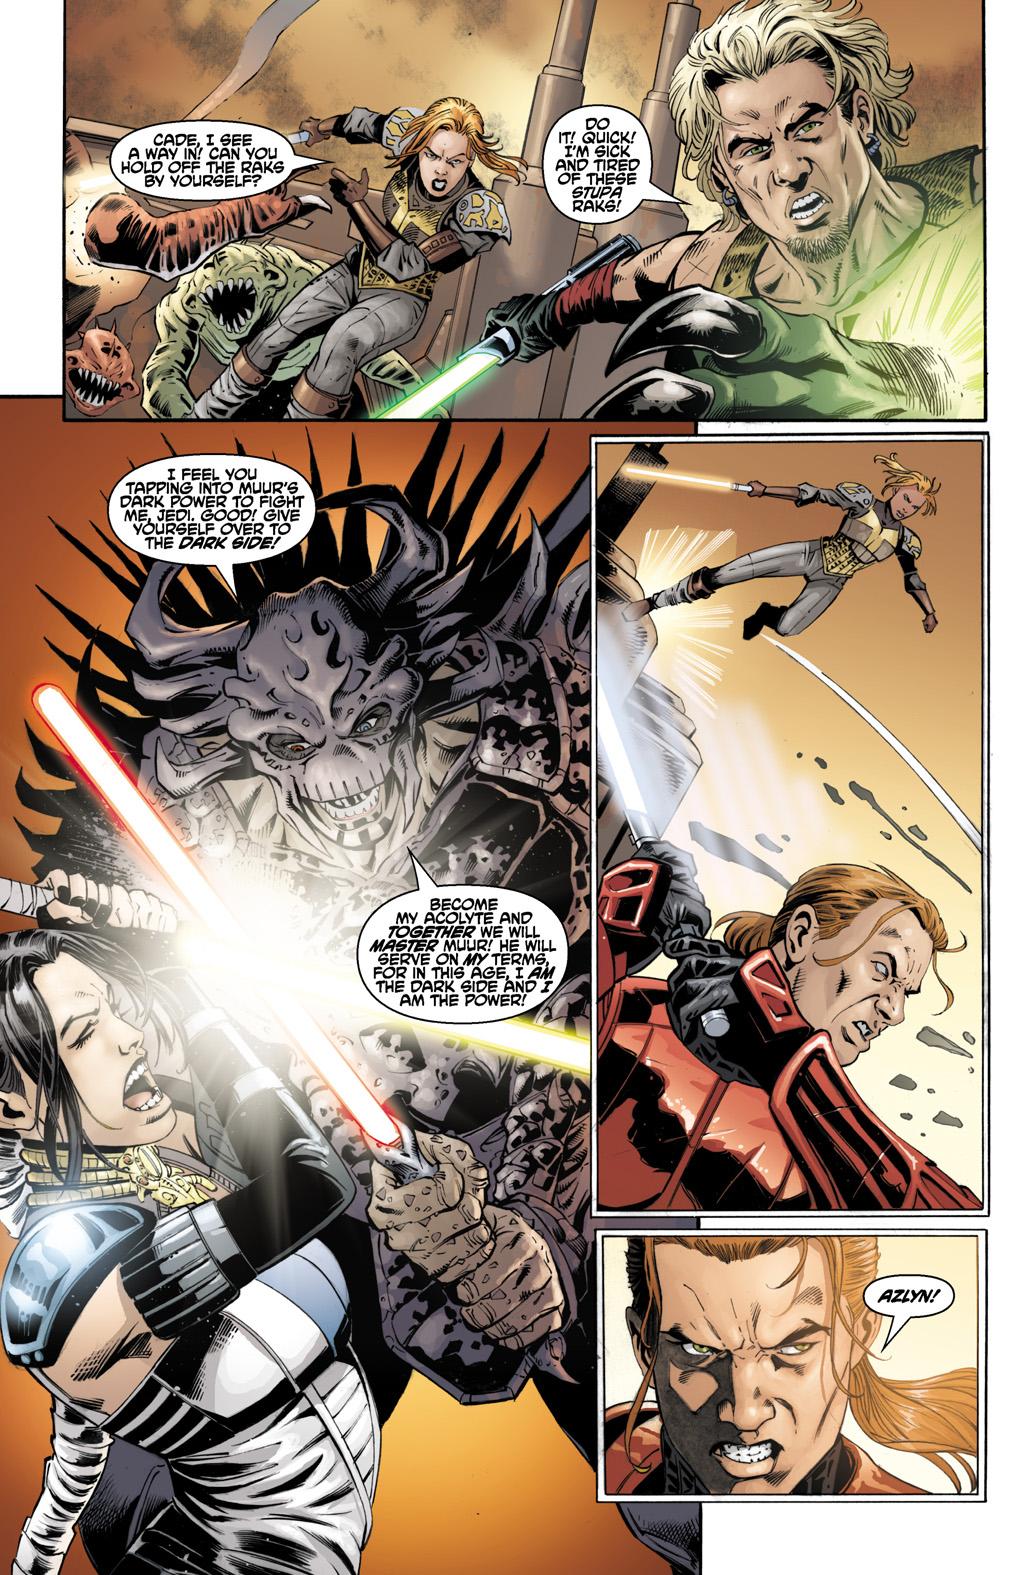 SS - Ajunta Pall (Cheth) vs Cade Skywalker (ArkhamAsylum3) - Page 2 NH_PiKxy4EFo-BOJ17yS6ygbRMNrOAKzldvapnqJmXiaj9gzYXEE2MNiVWJ1za6_QON1T4dGkAAs1600